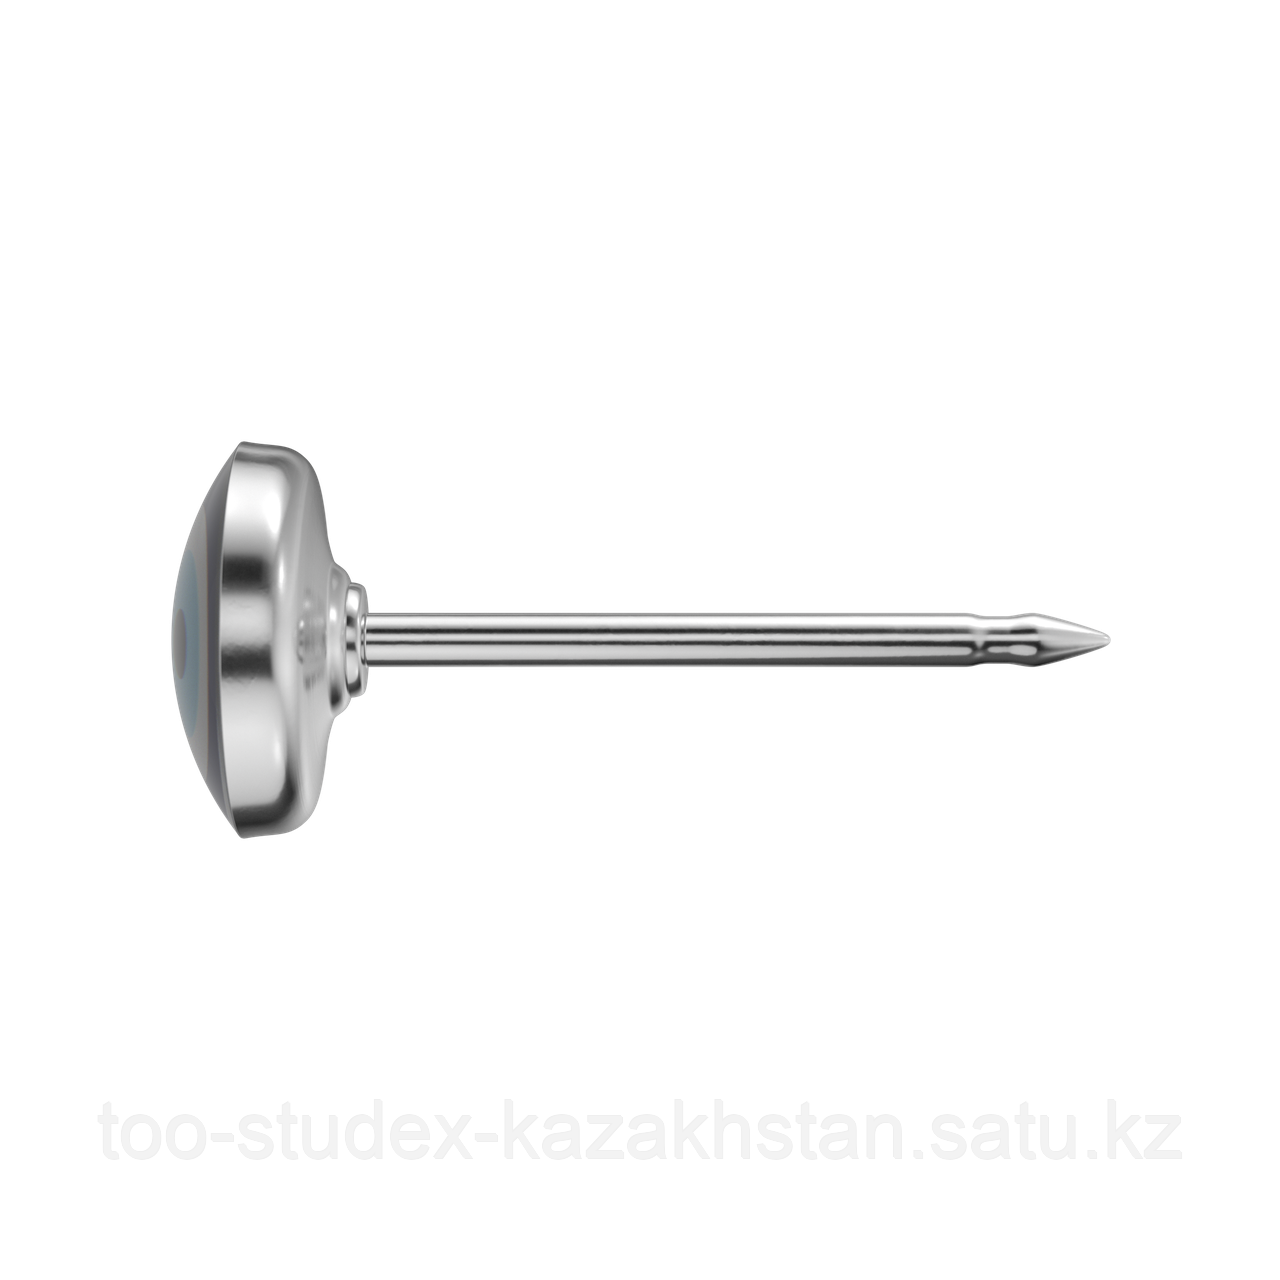 "7512-0668 Серьги для прокола STUDEX System75 ""Назар"" - фото 4"